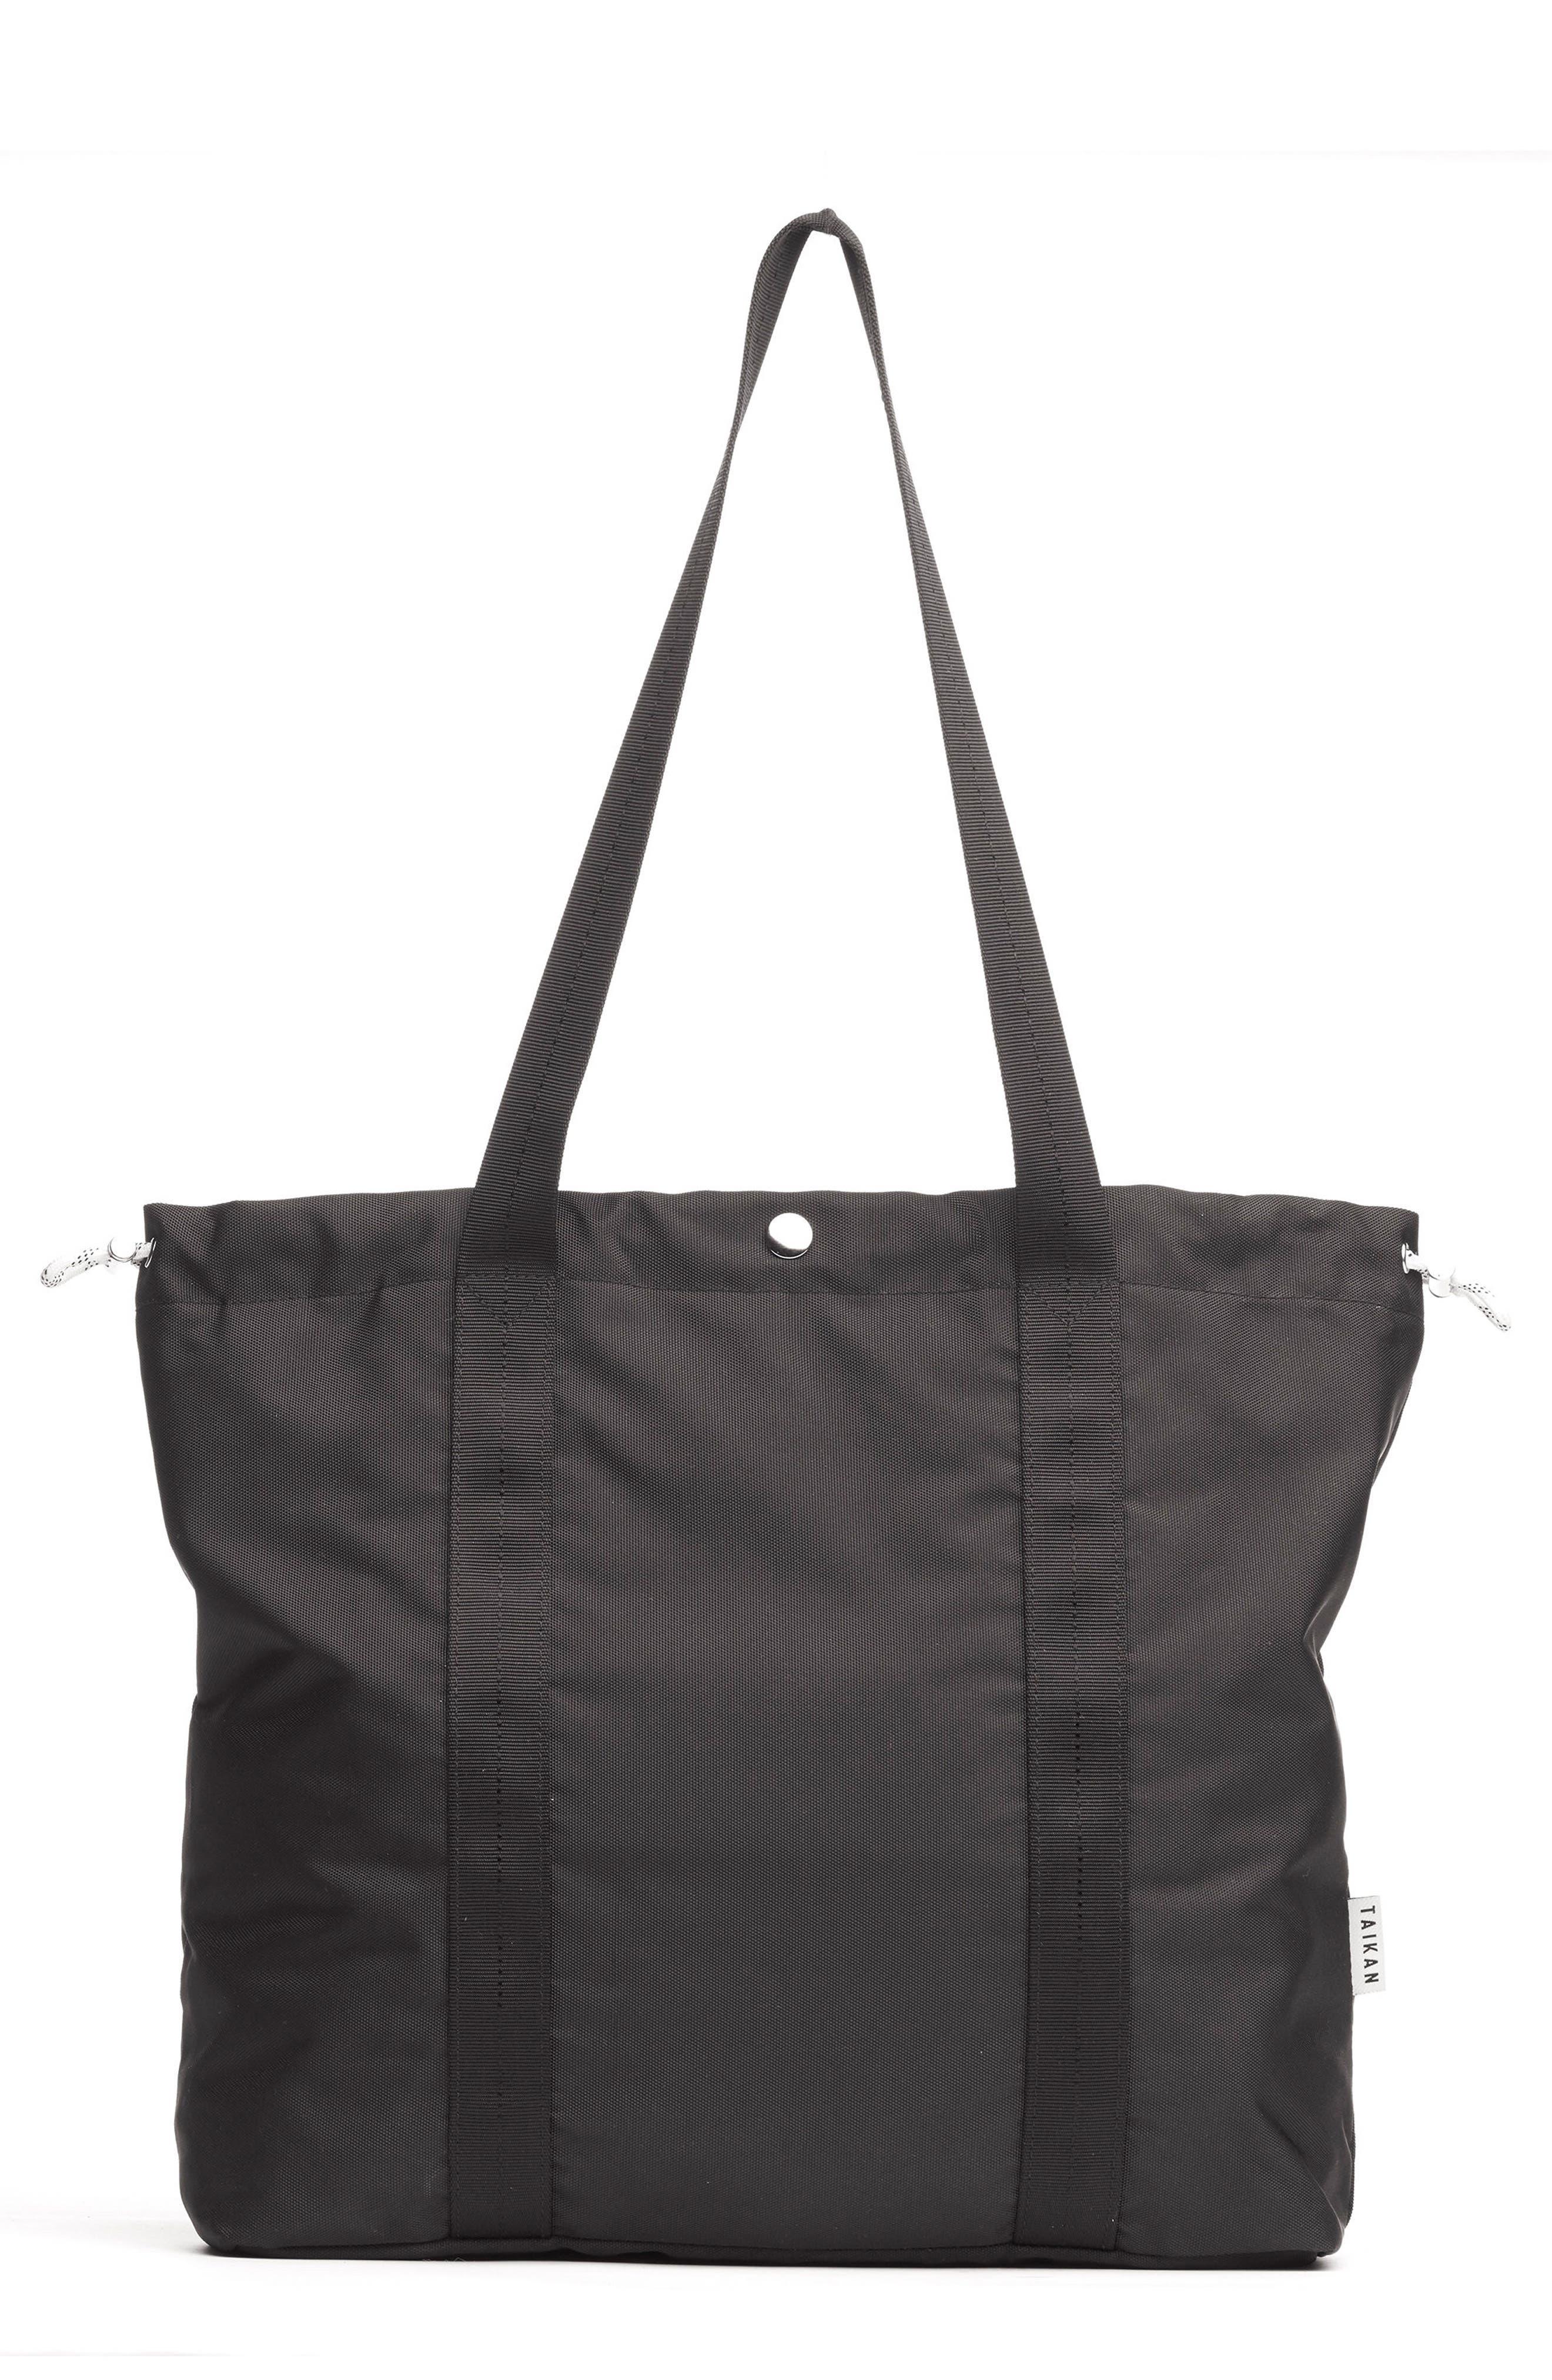 Flanker Tote Bag,                             Main thumbnail 1, color,                             MATTE BLACK